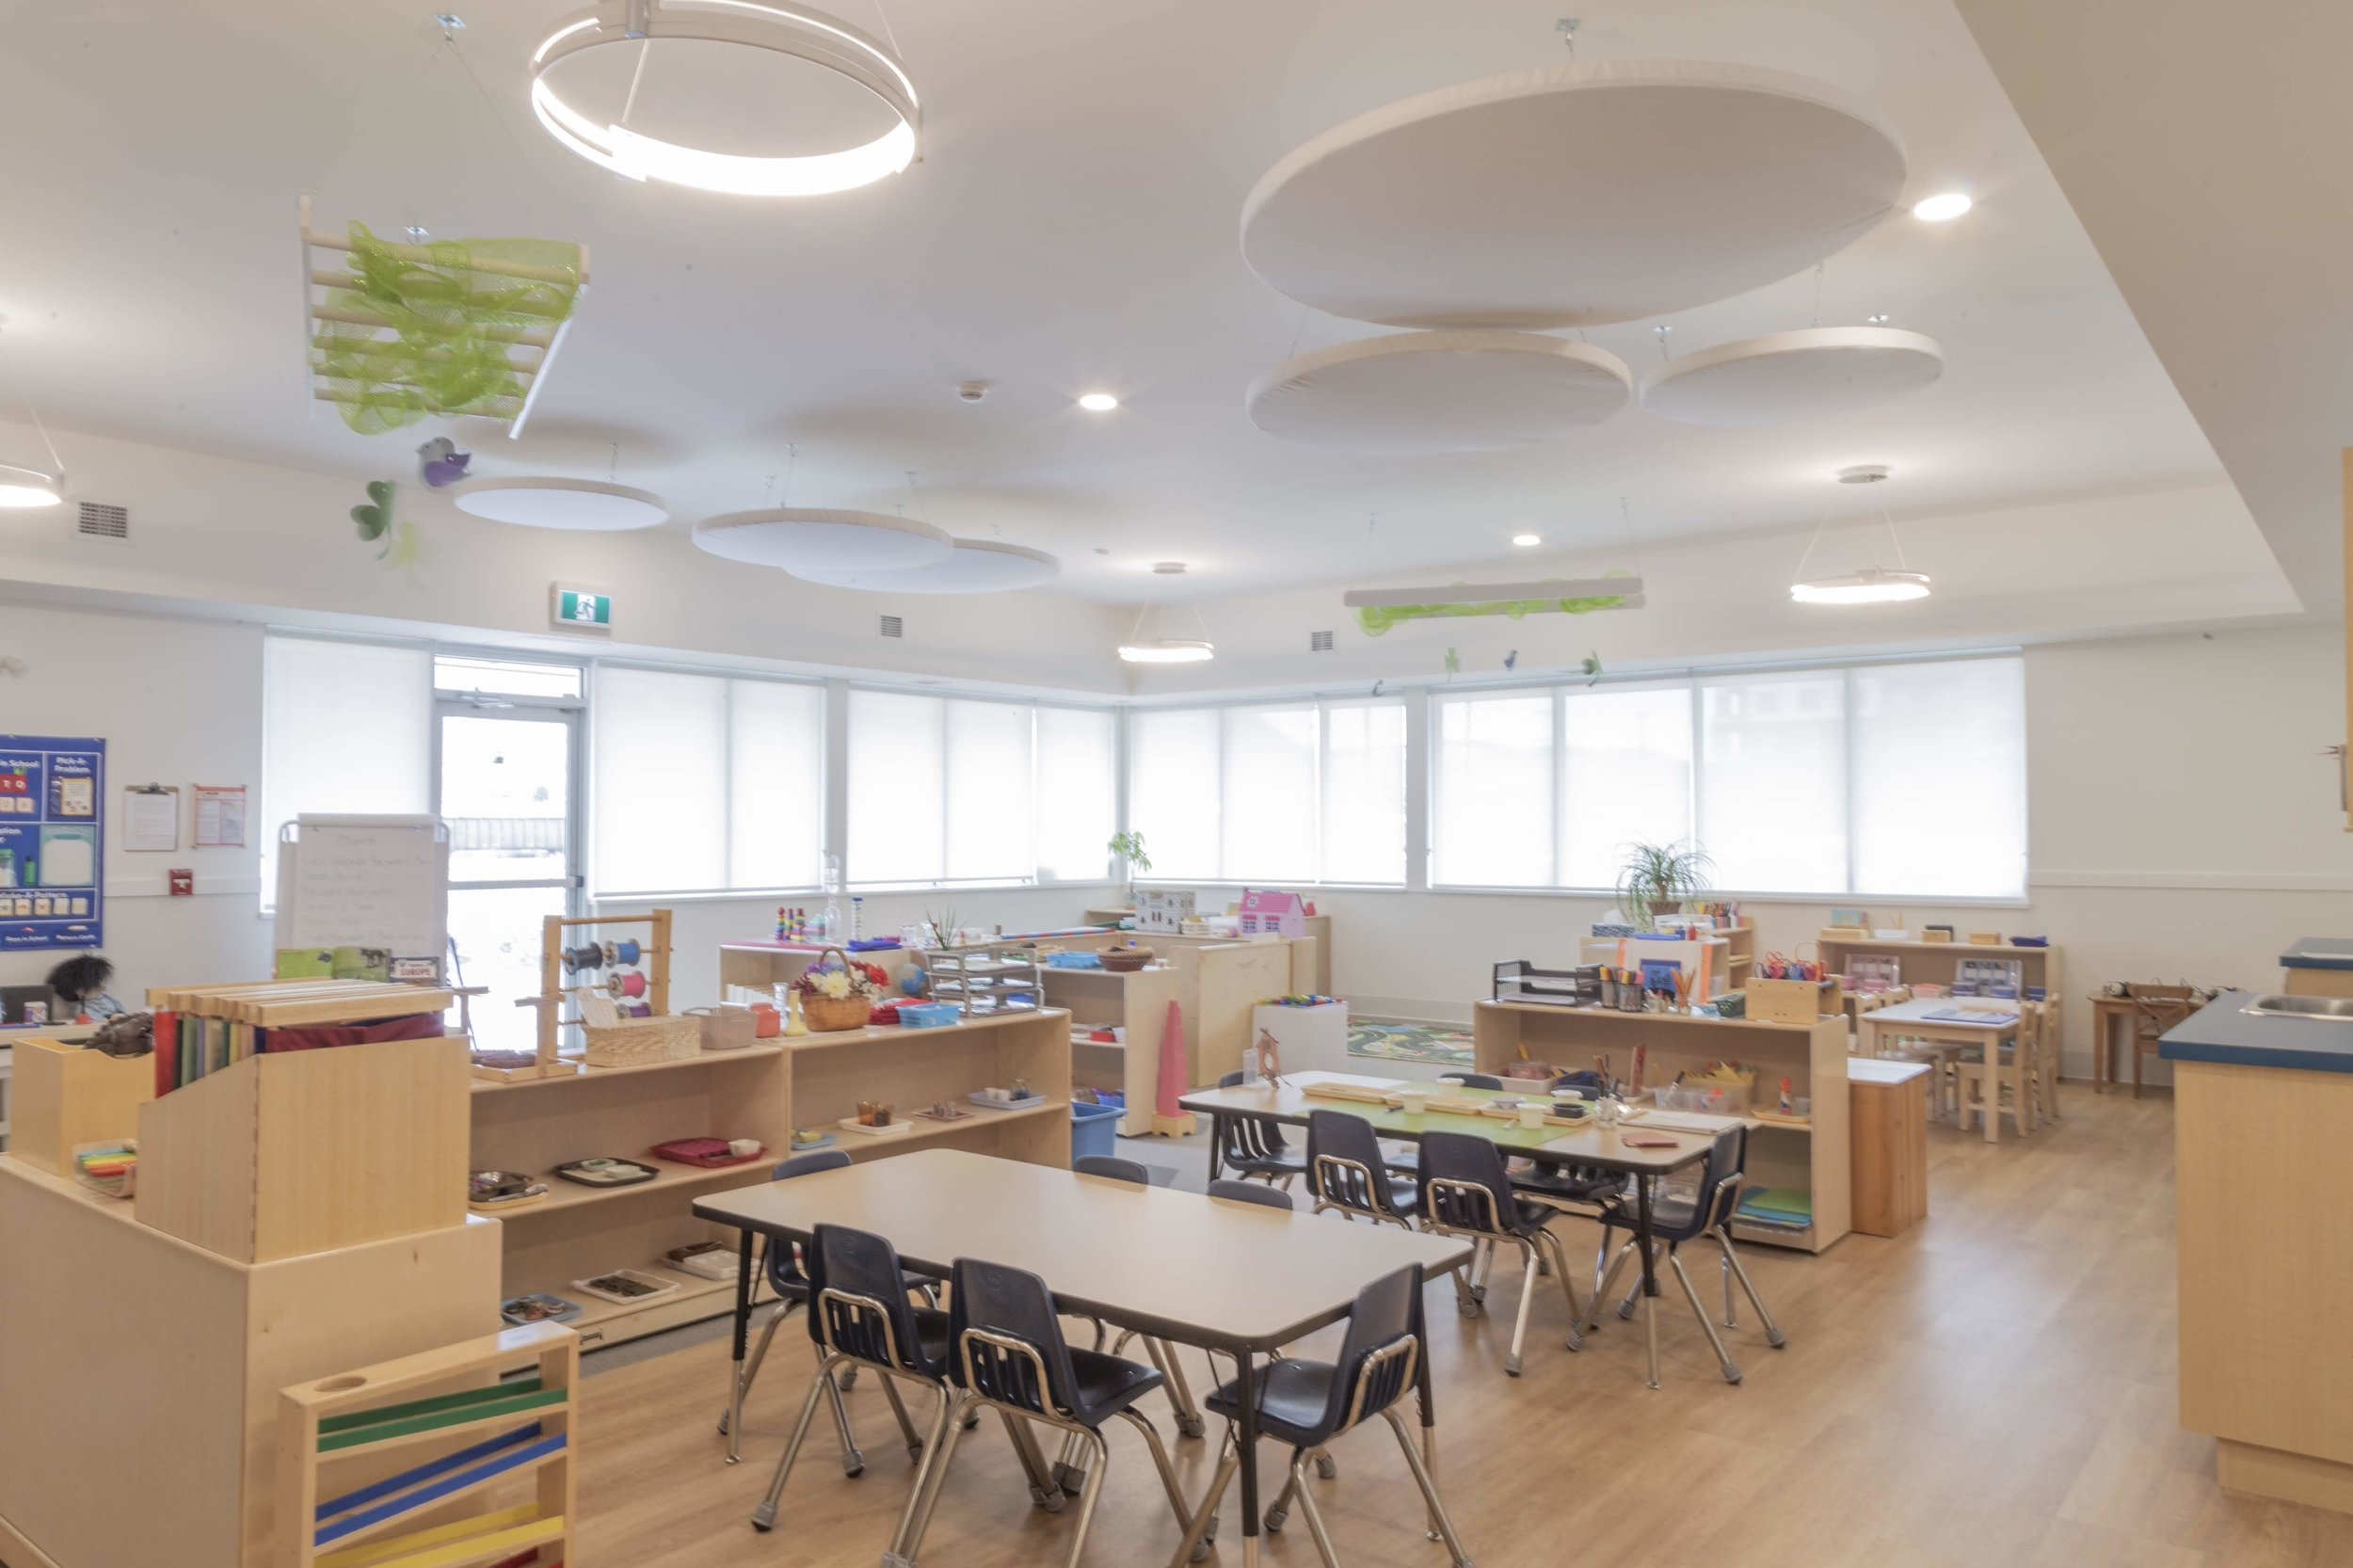 Photo of classroom interior